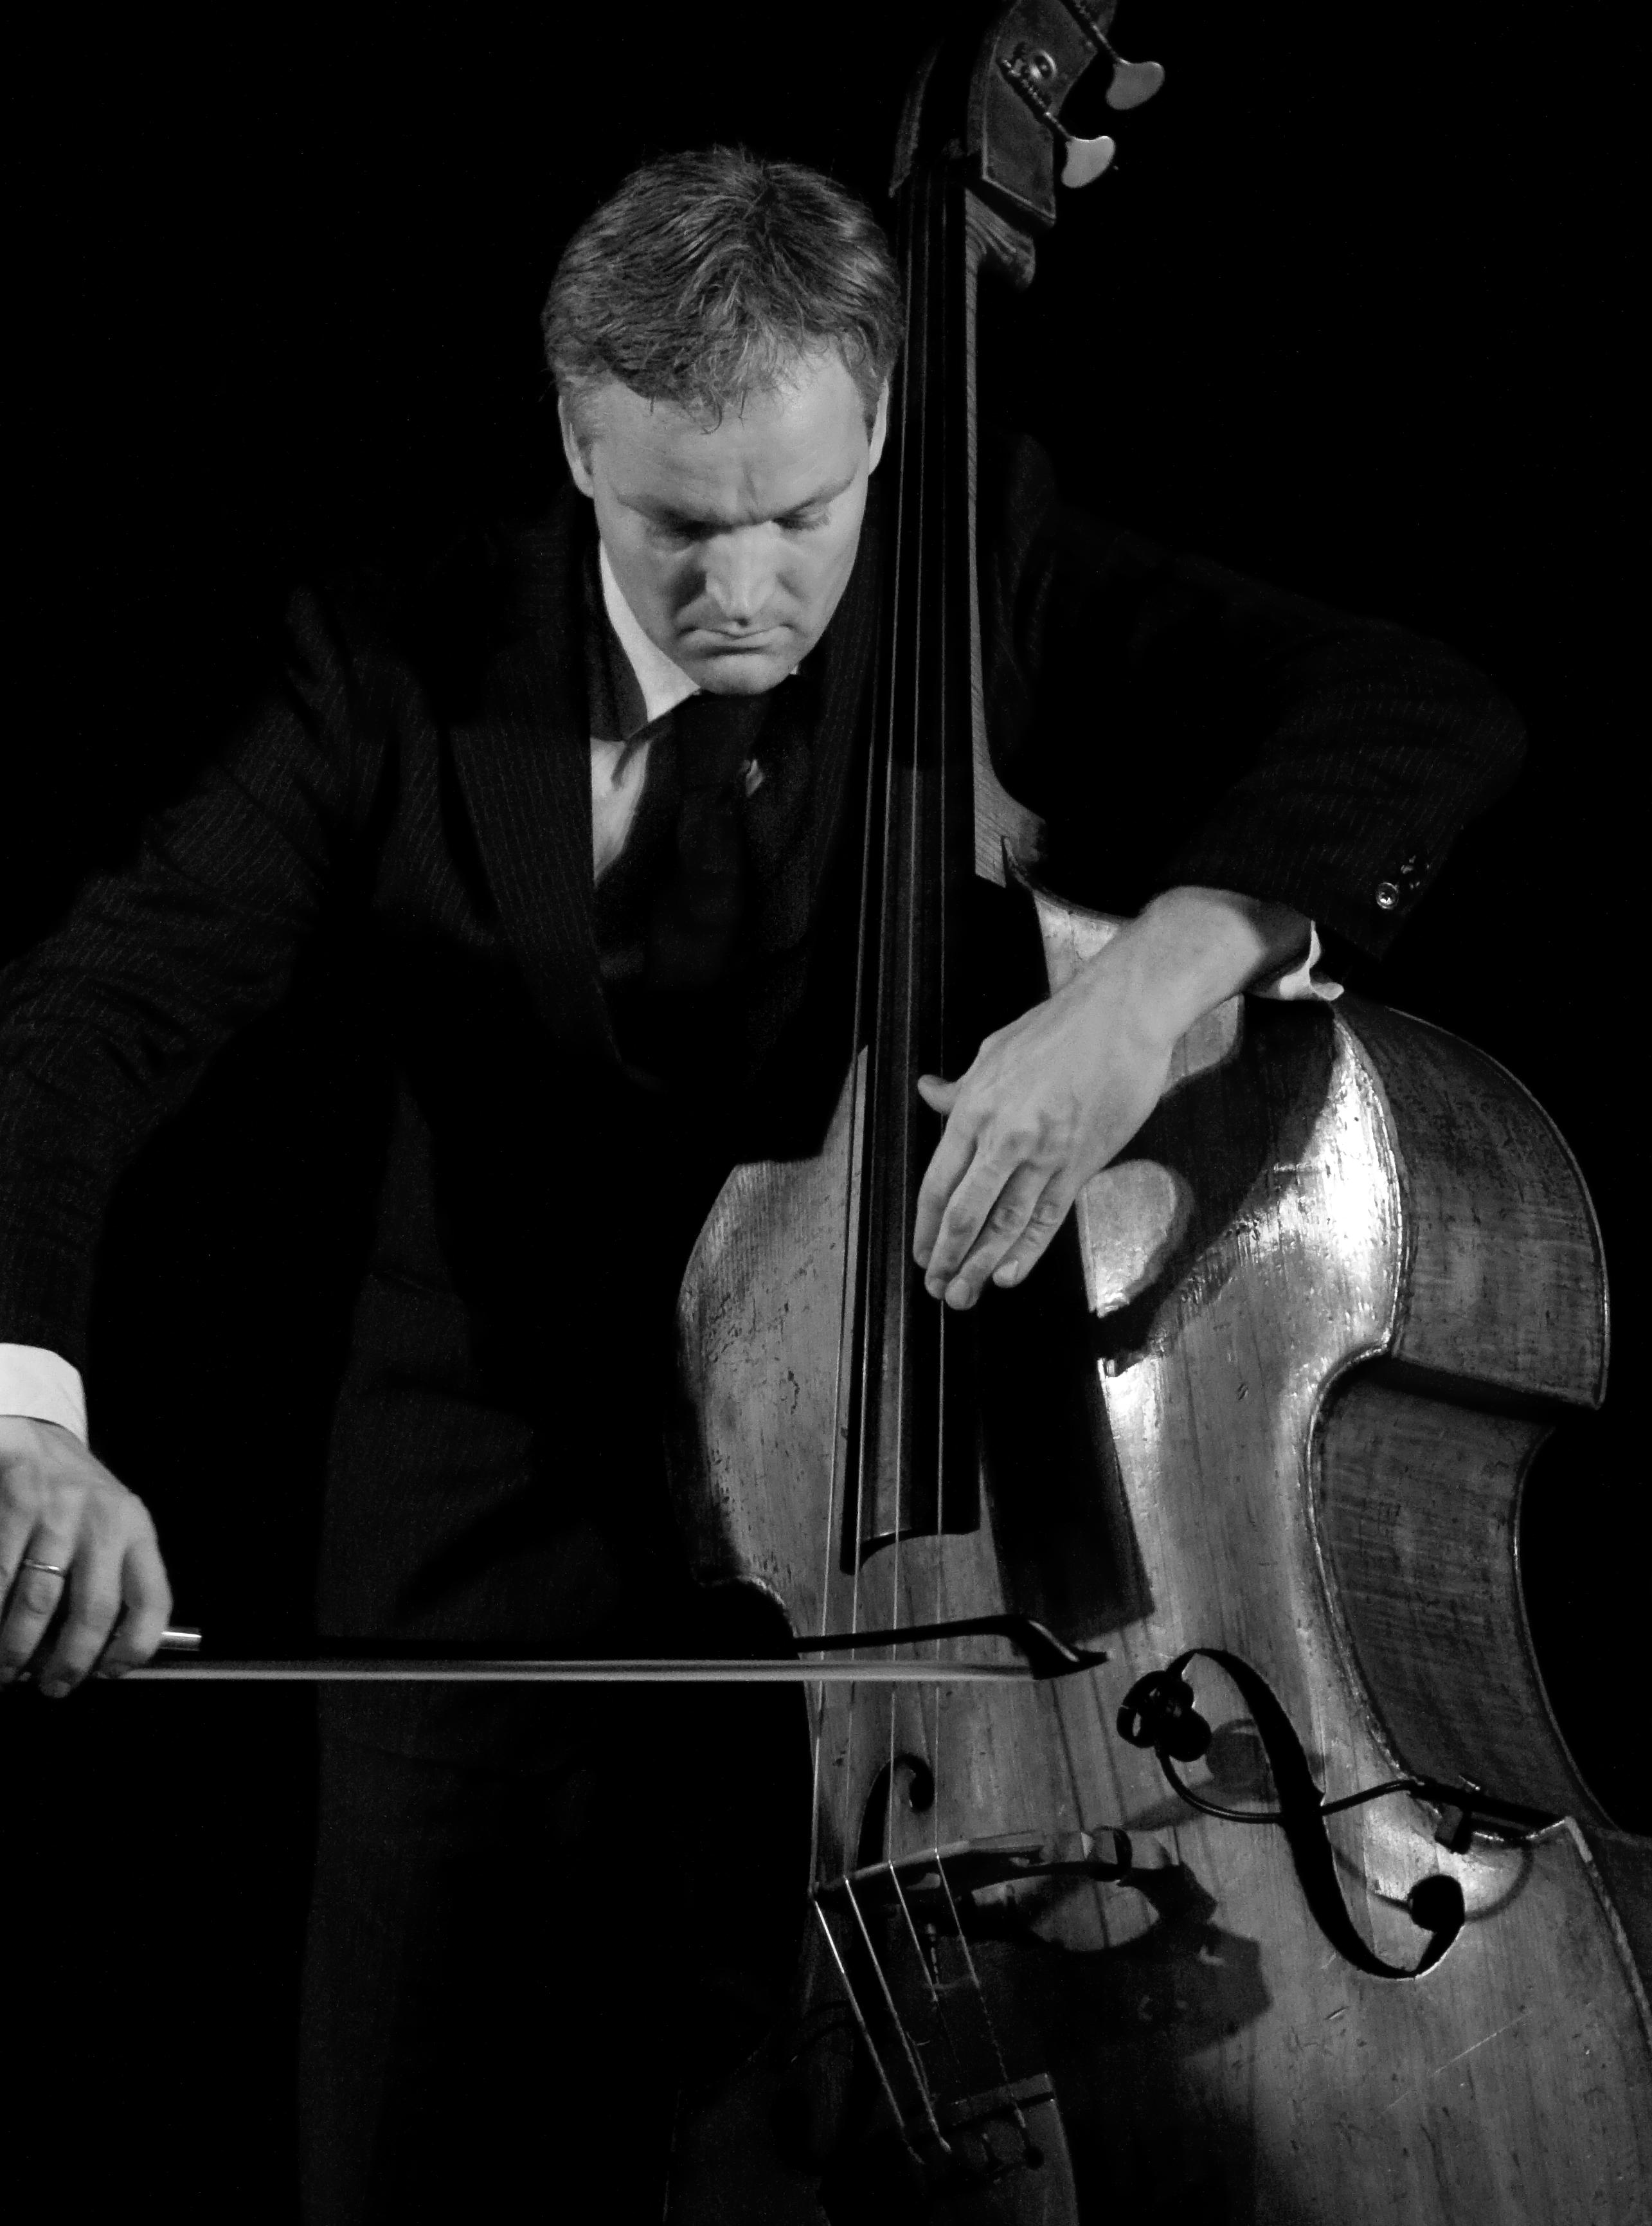 低音提琴/Contrabass、Doublebass、Stringbass/コントラバス/Kontrabass(Kontrabaß)、Bassgeige(Baßgeige)/Contrebasse/Contrabbasso